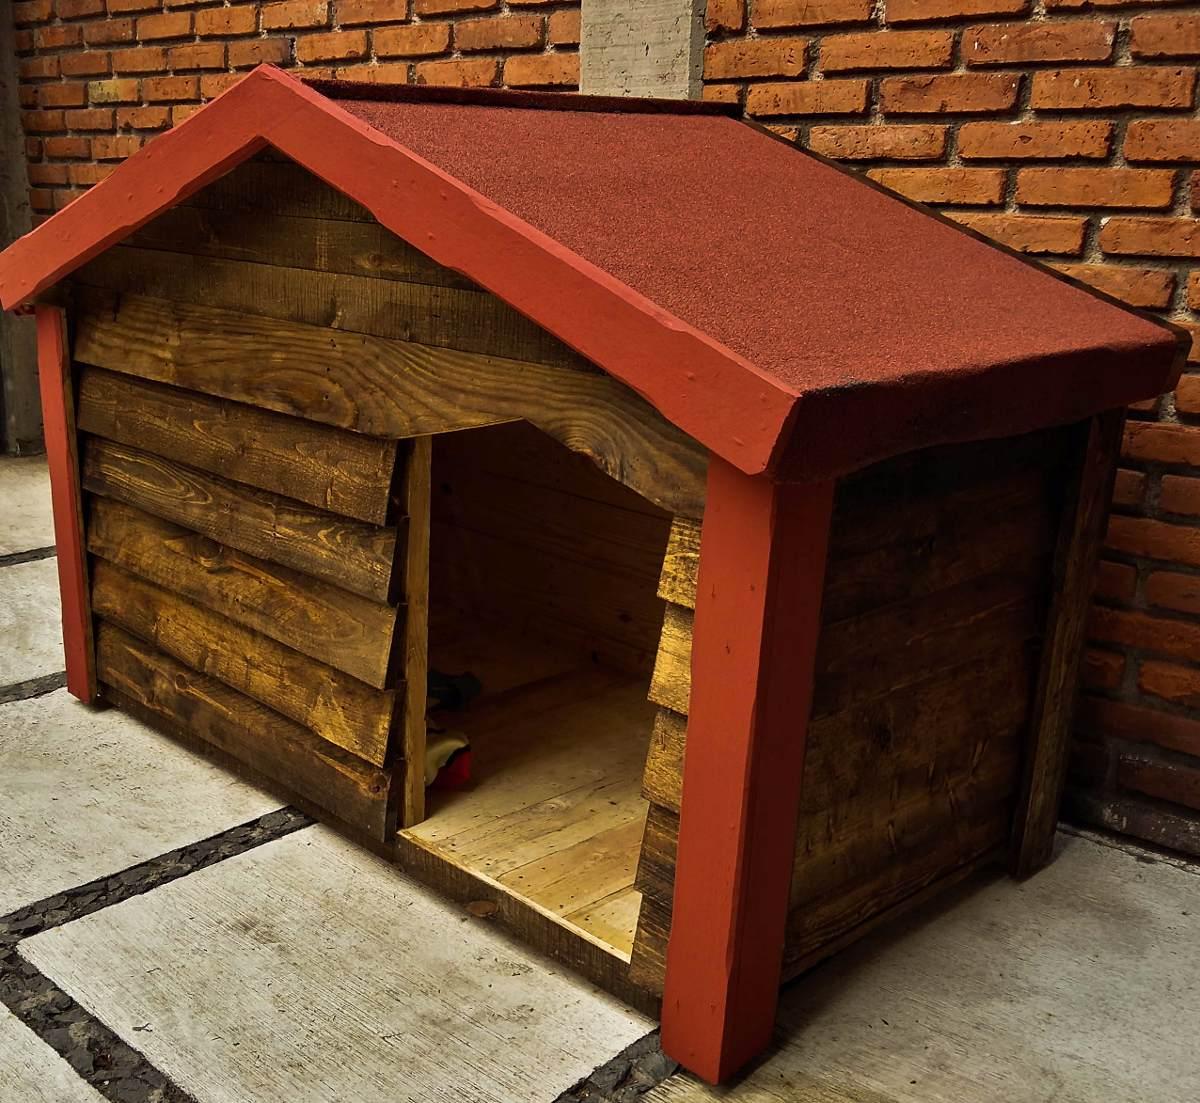 Casa de madera para perro extragrande dogo 3 en - Madera para casa ...